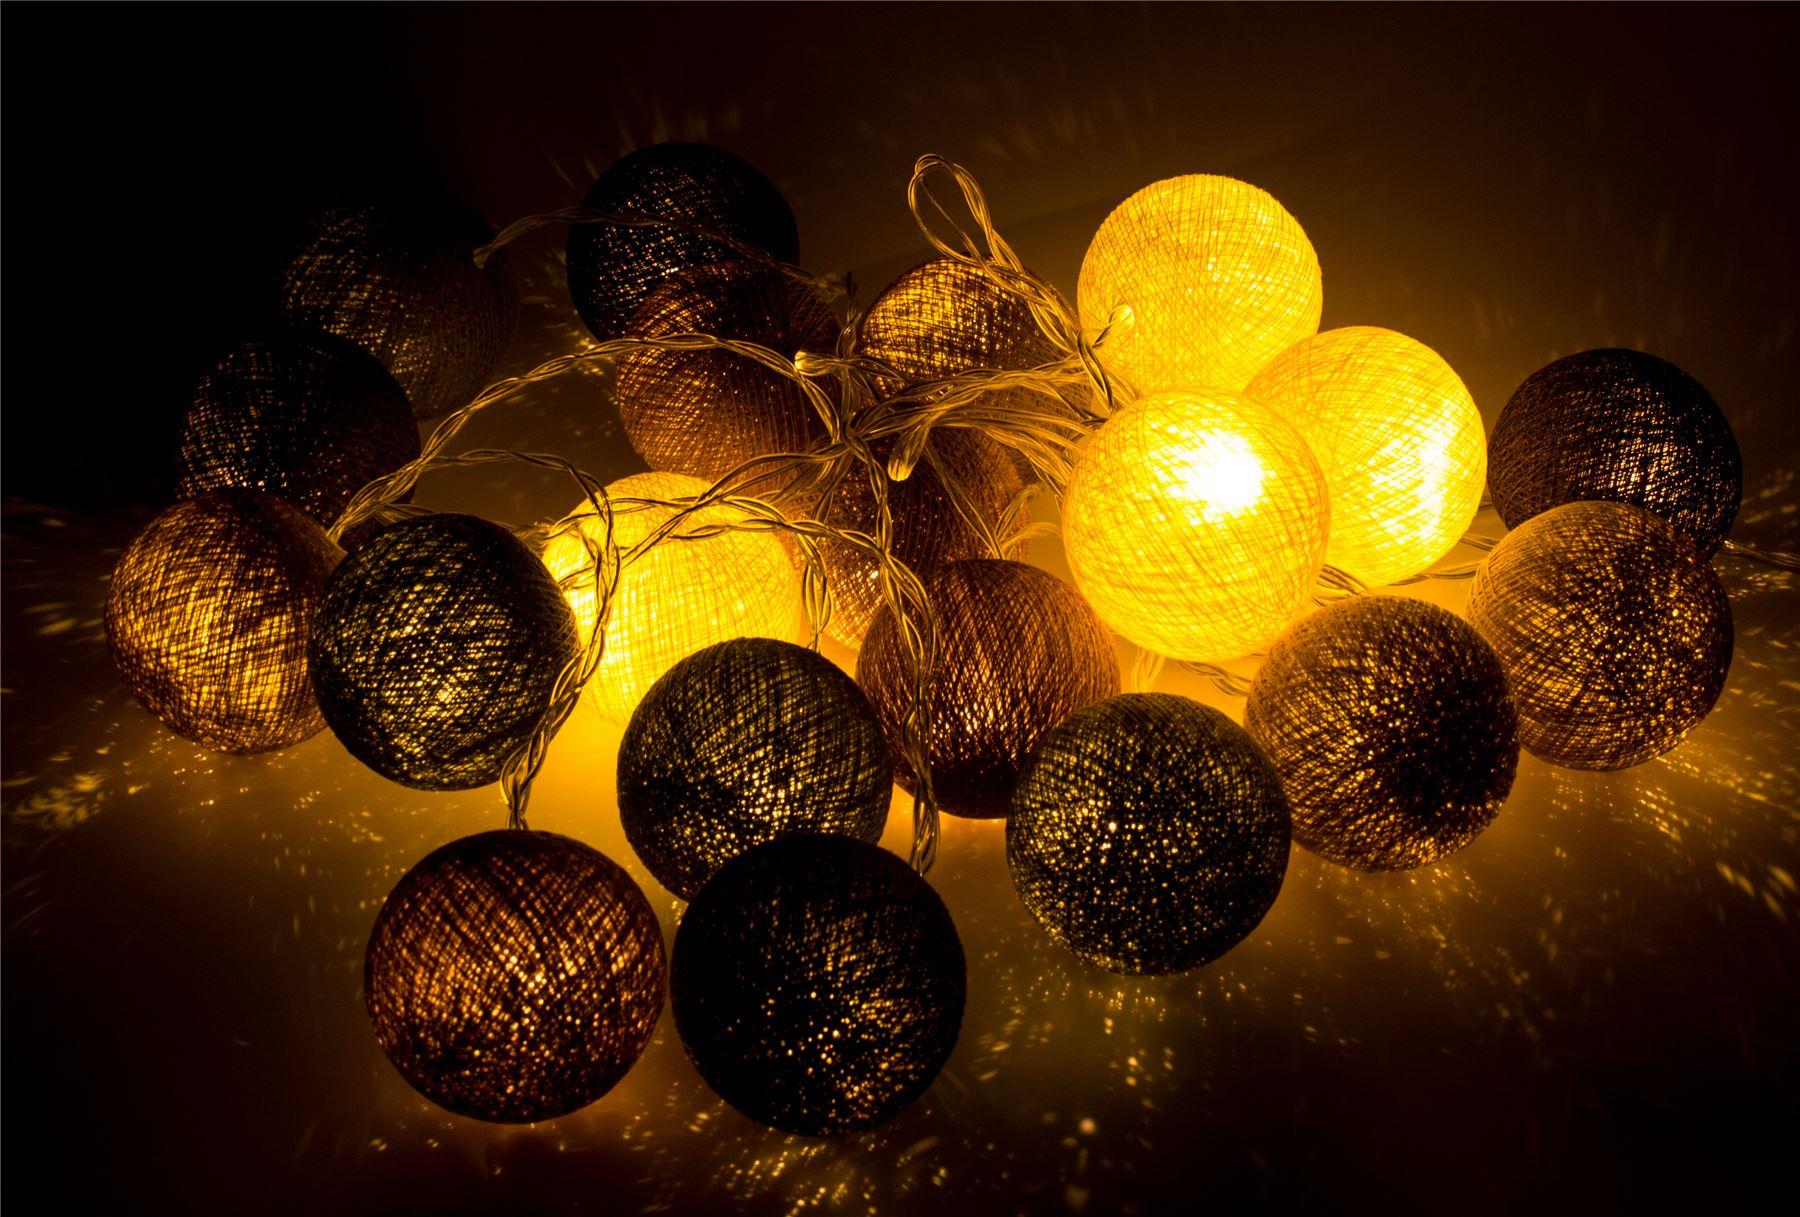 Ball String Lights Indoor : Cotton Ball String Fairy Lights/Indoor Christmas Bedroom Party Patio Wedding eBay